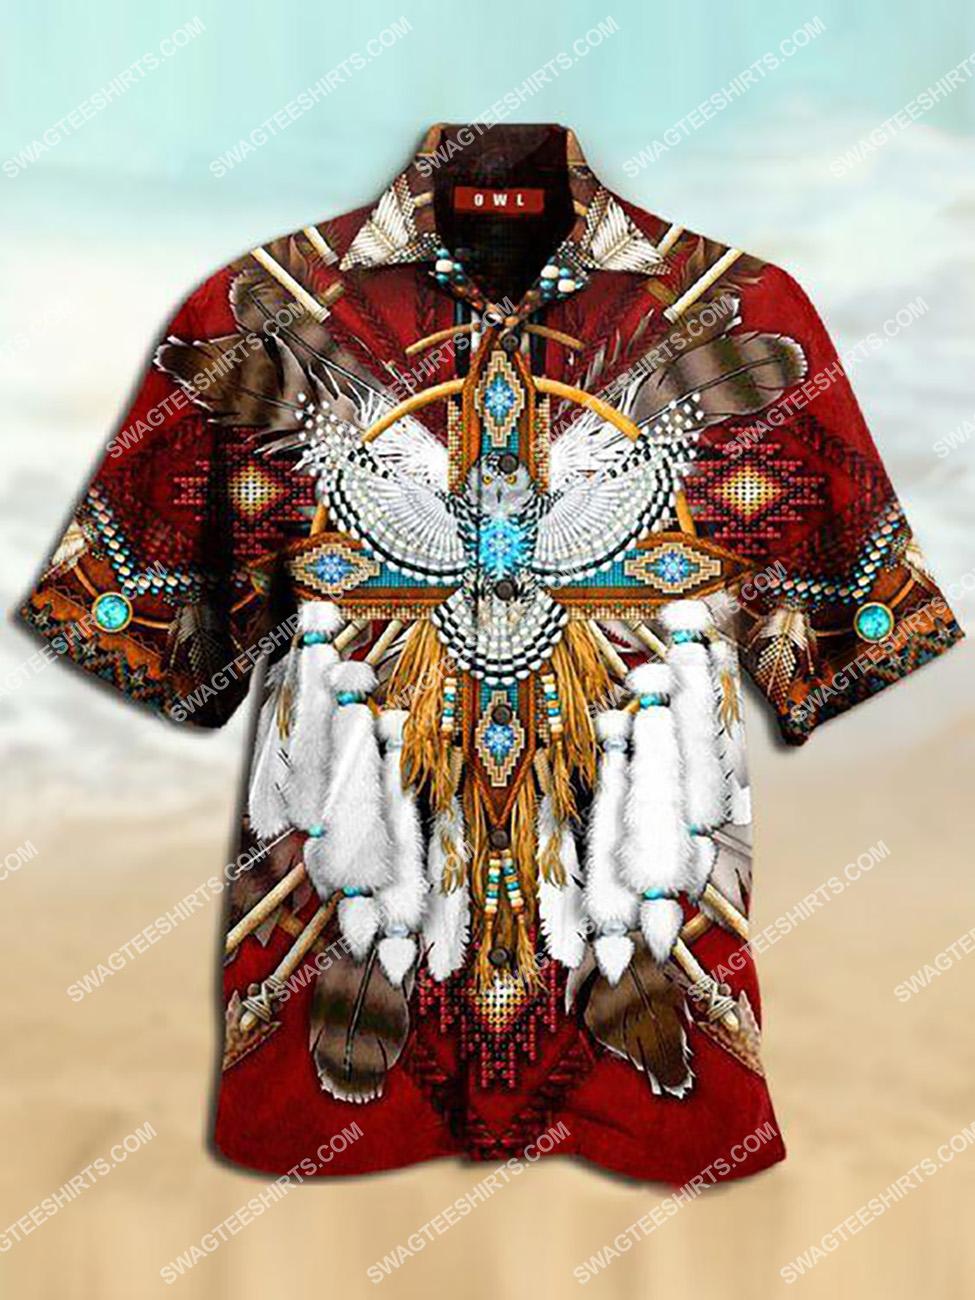 the native american owl all over printed hawaiian shirt 1(2) - Copy